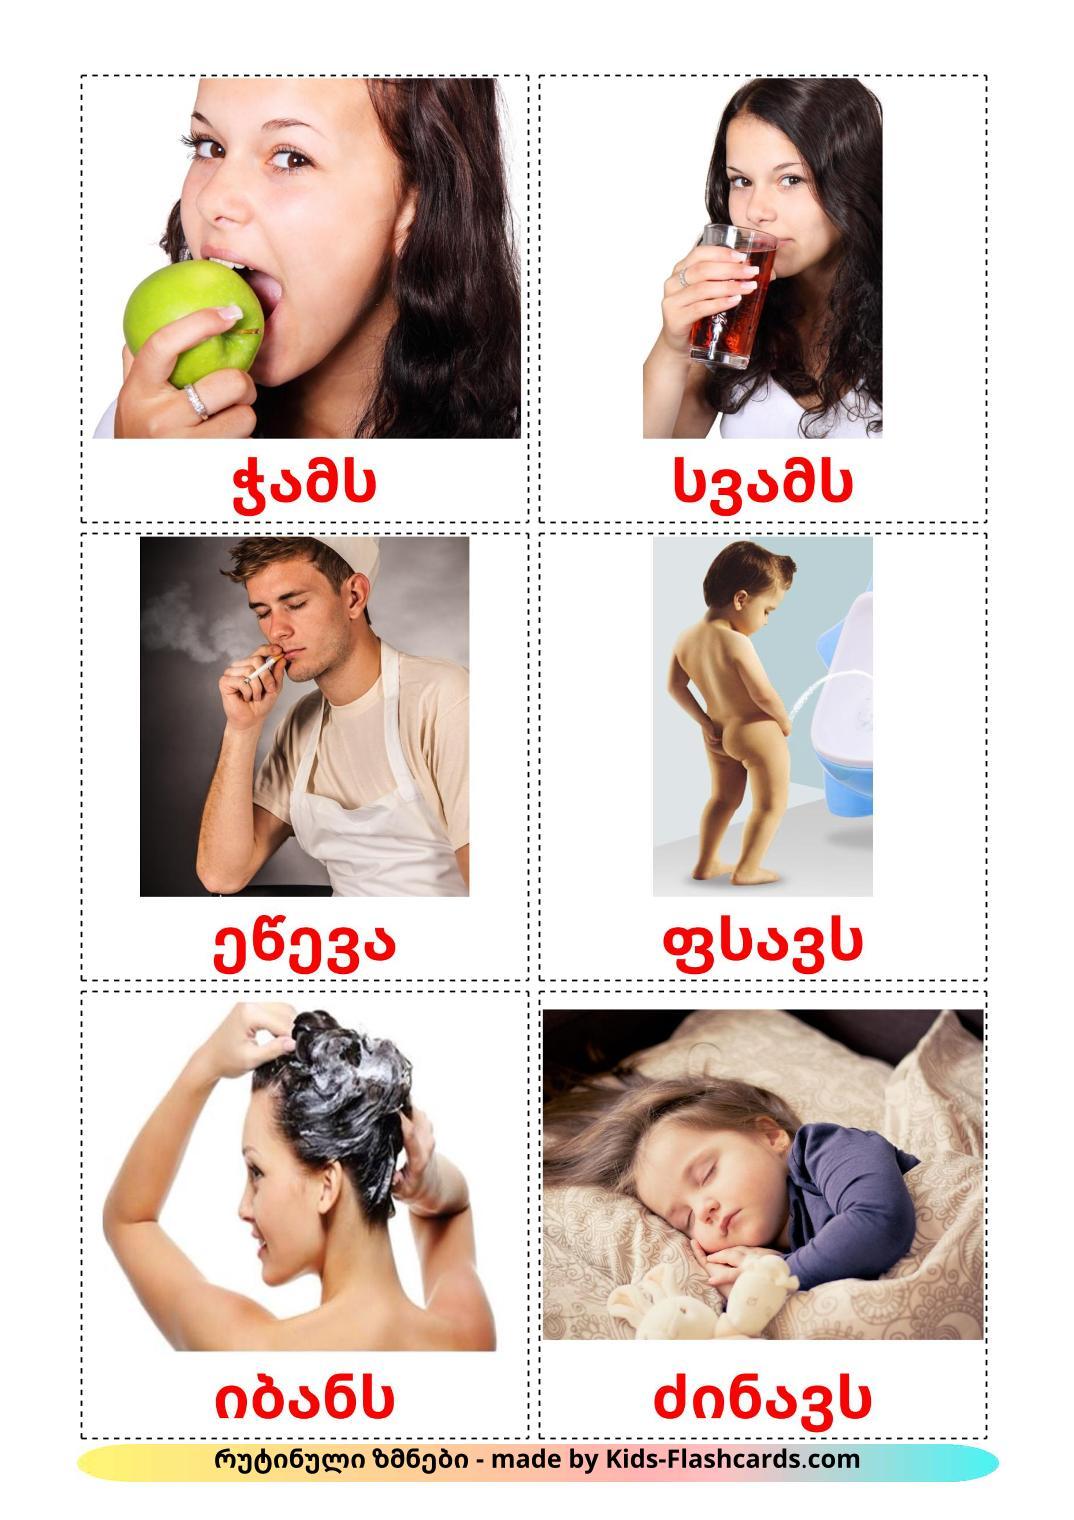 Routine verbs - 2 Free Printable georgian Flashcards